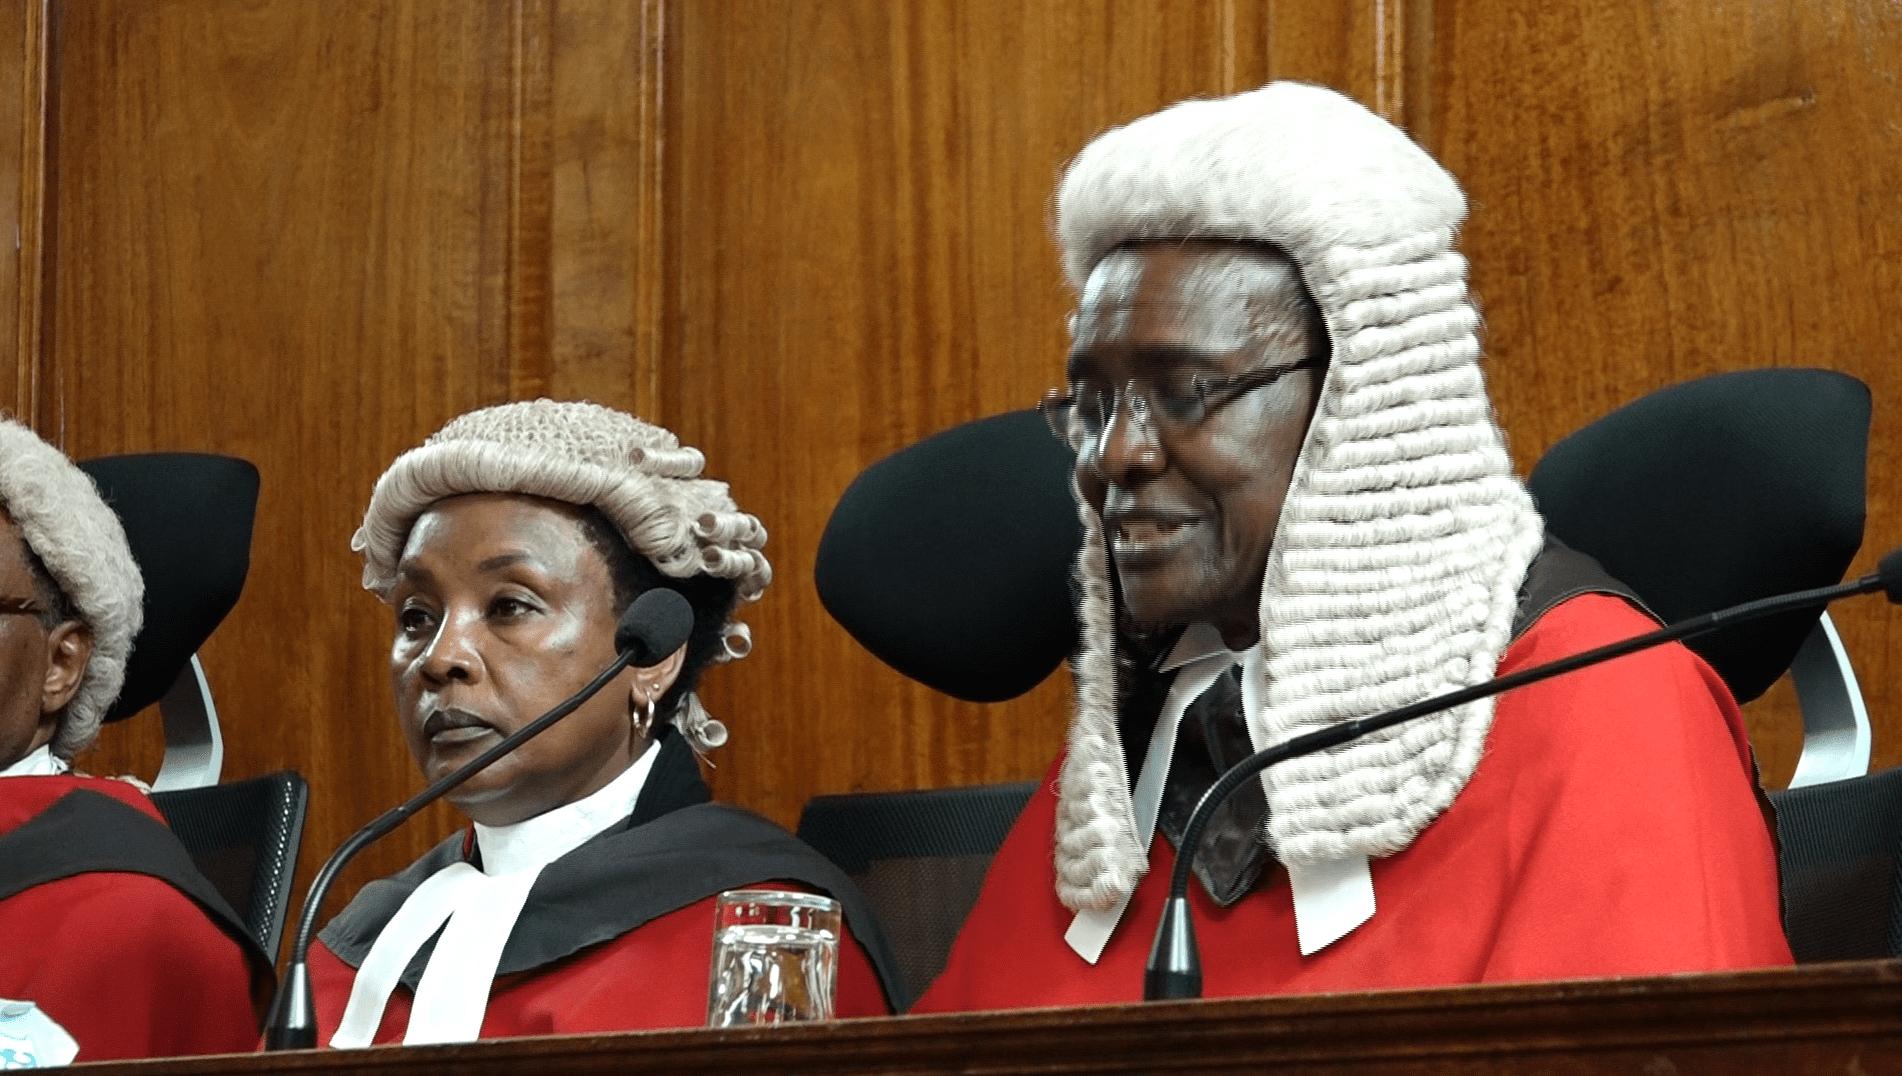 Maraga, Mwilu challenge President Kenyatta's lawyer on nominations